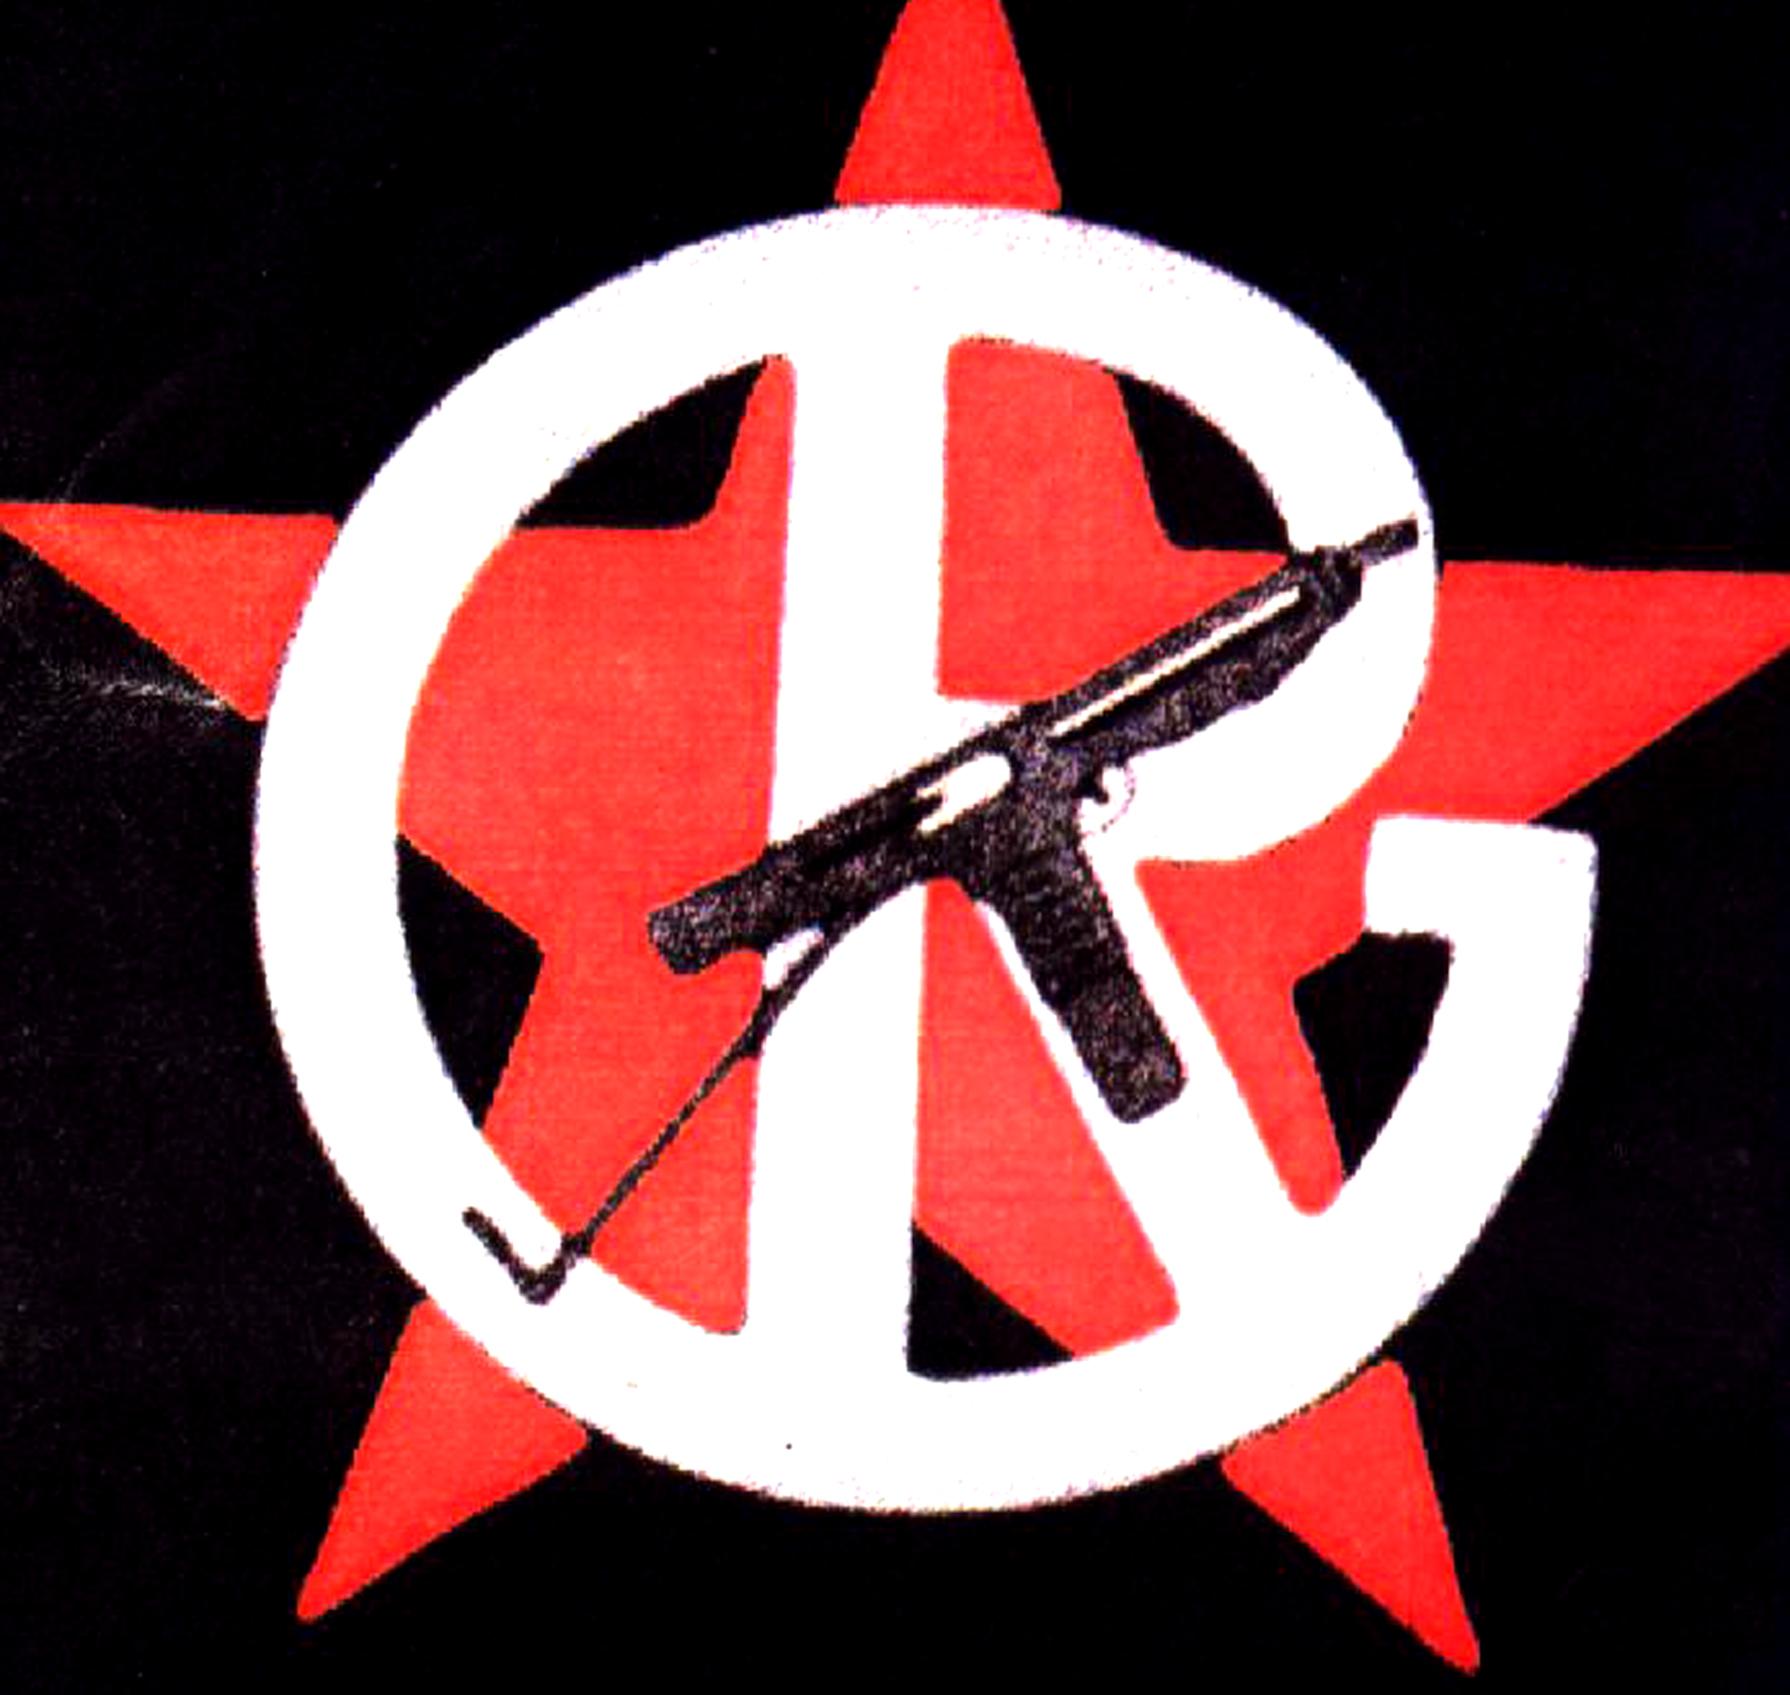 Símbolo utilizado por GRAPO